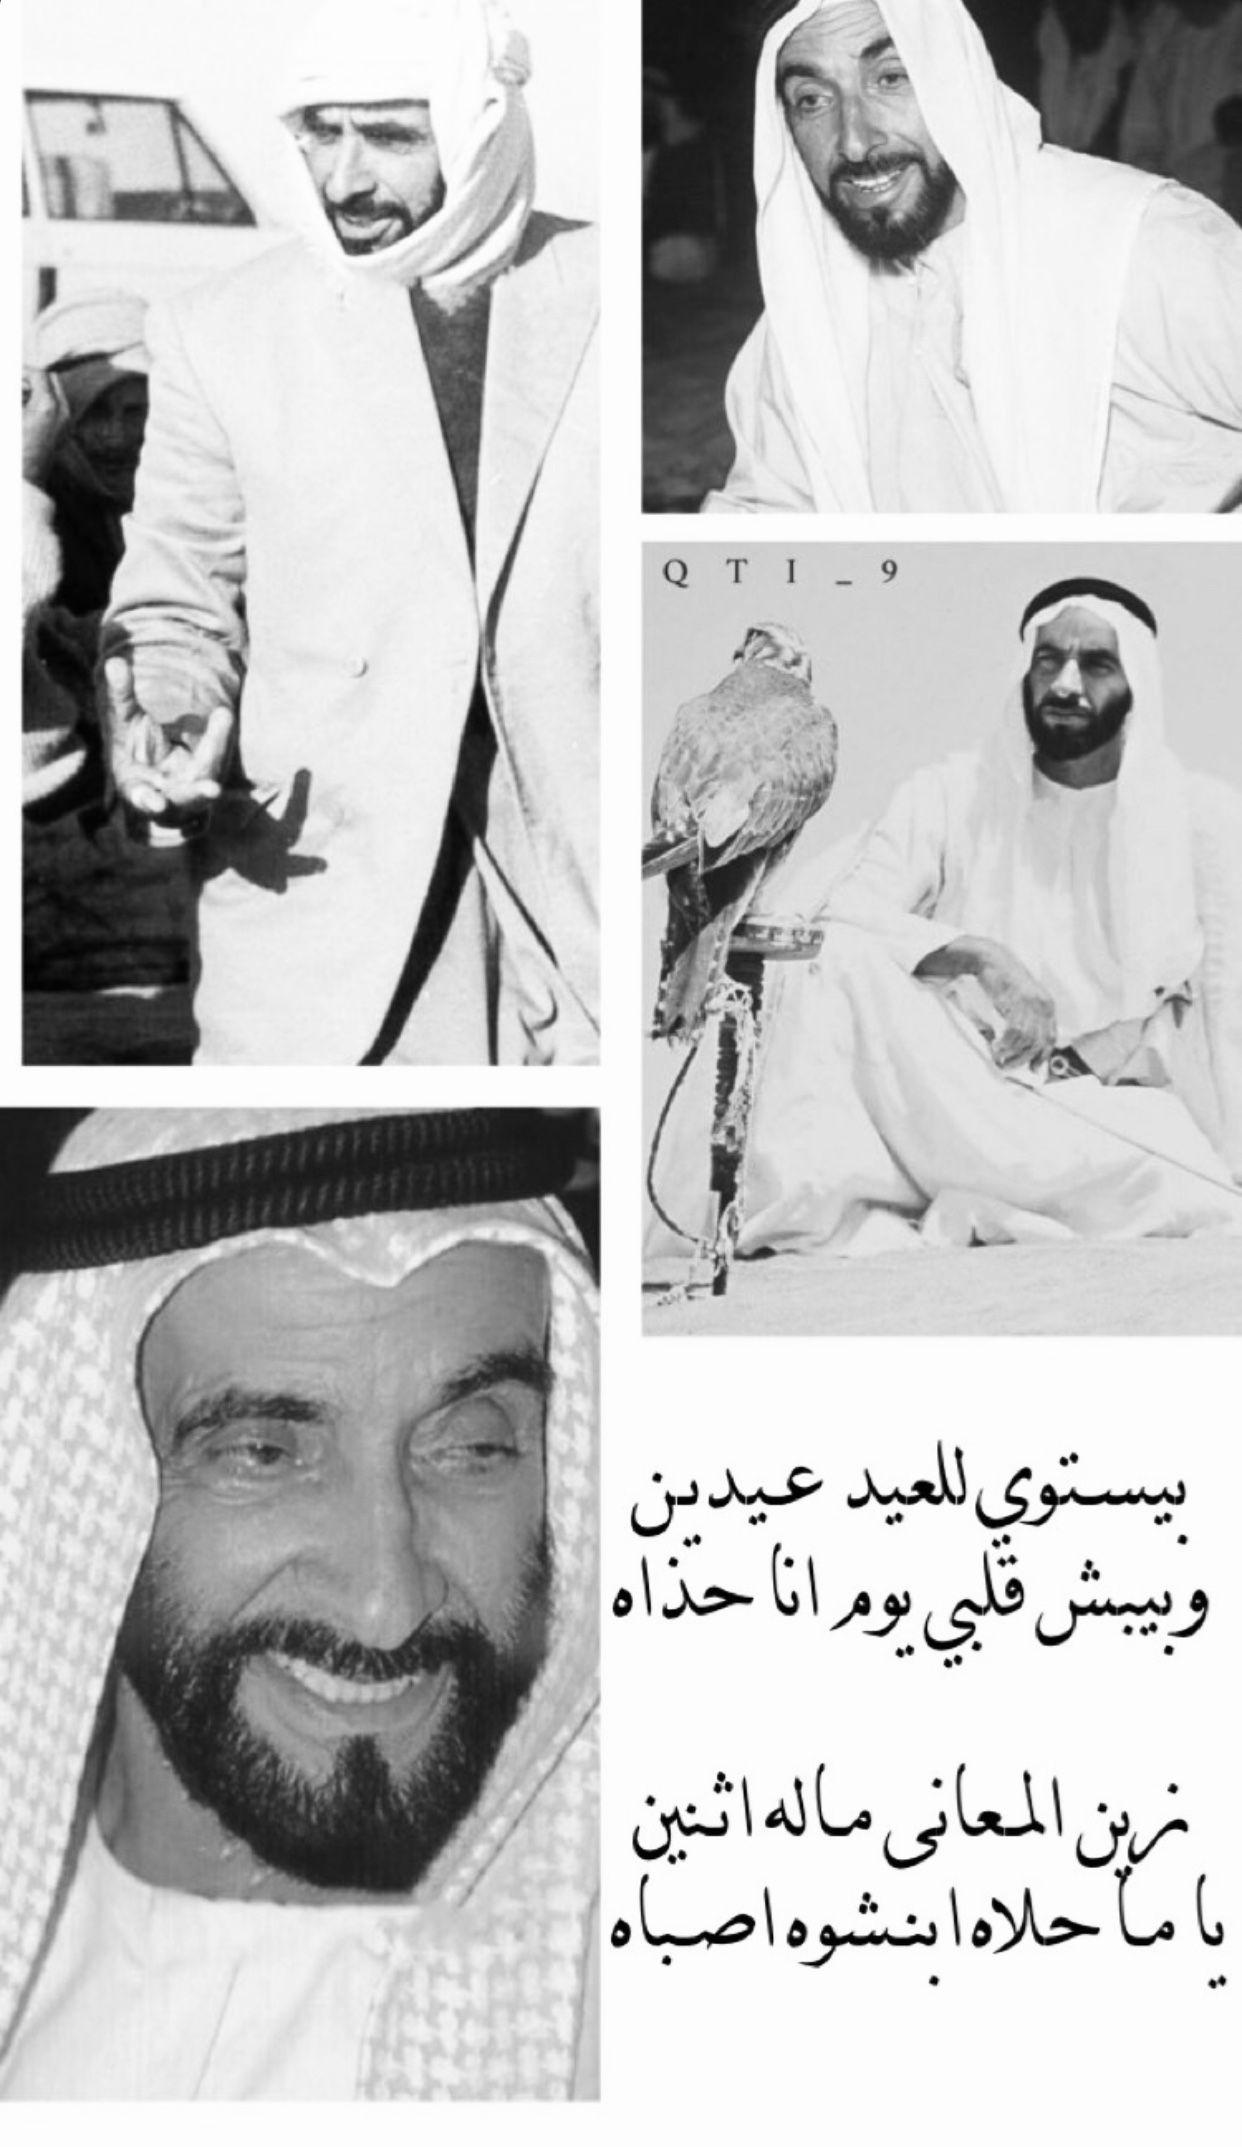 الشيخ زايد الله يغفر له Arabian Beauty Arabic Love Quotes Love Quotes